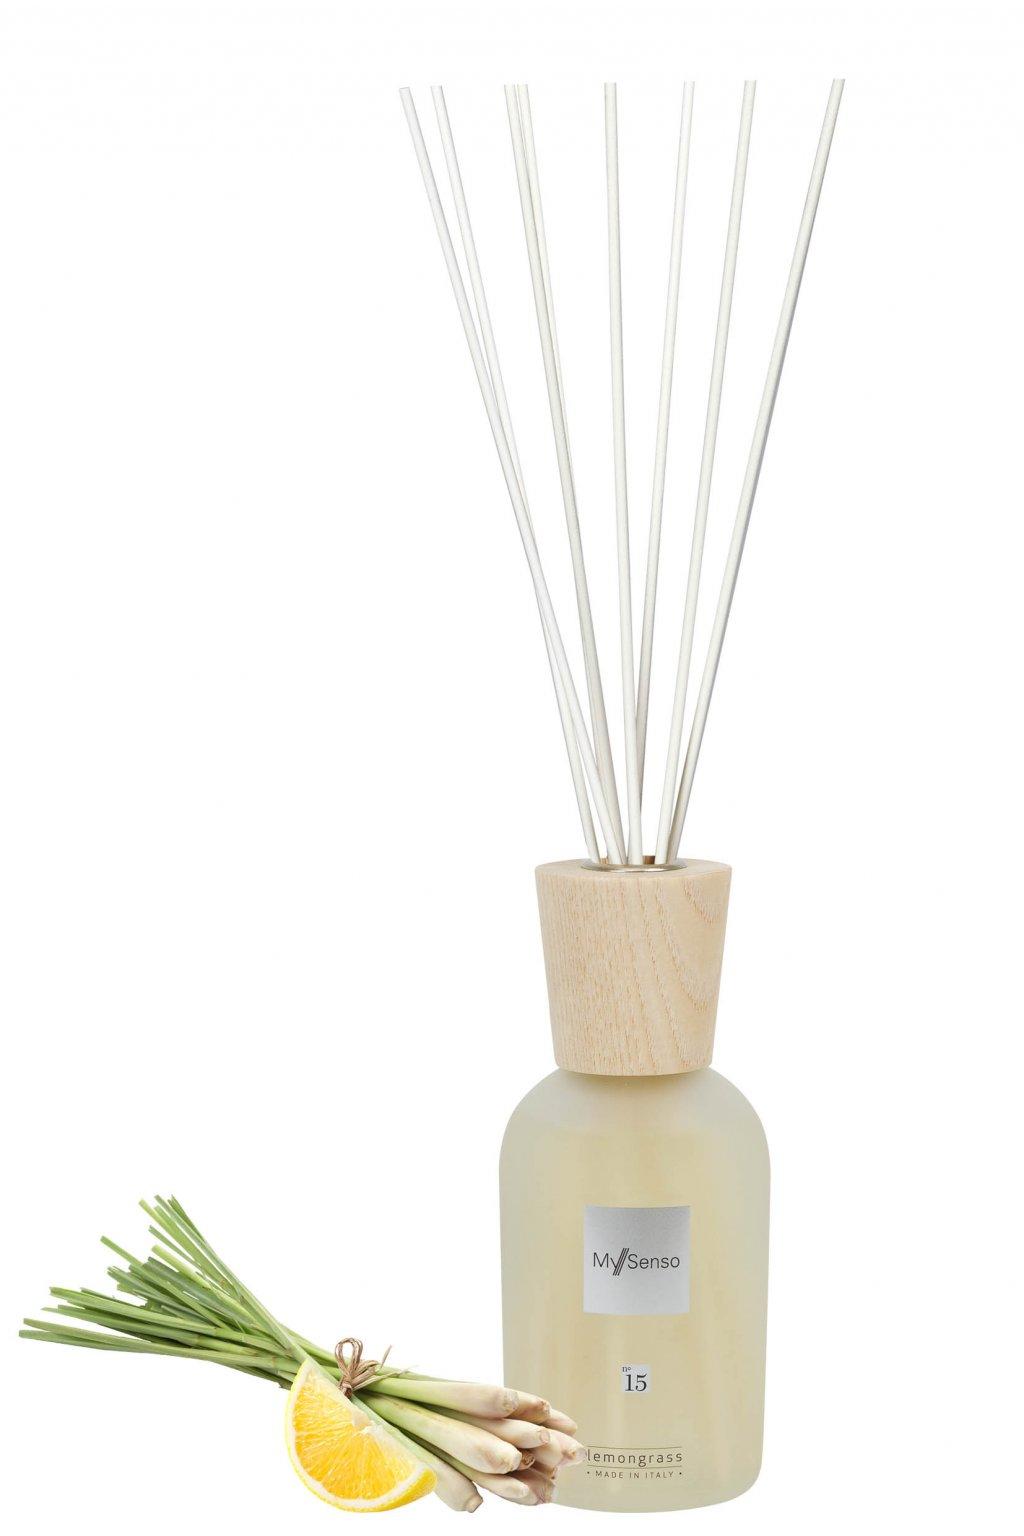 123 my senso aromaticky difuzer premium n 15 lemongrass 240ml cerstvy citron